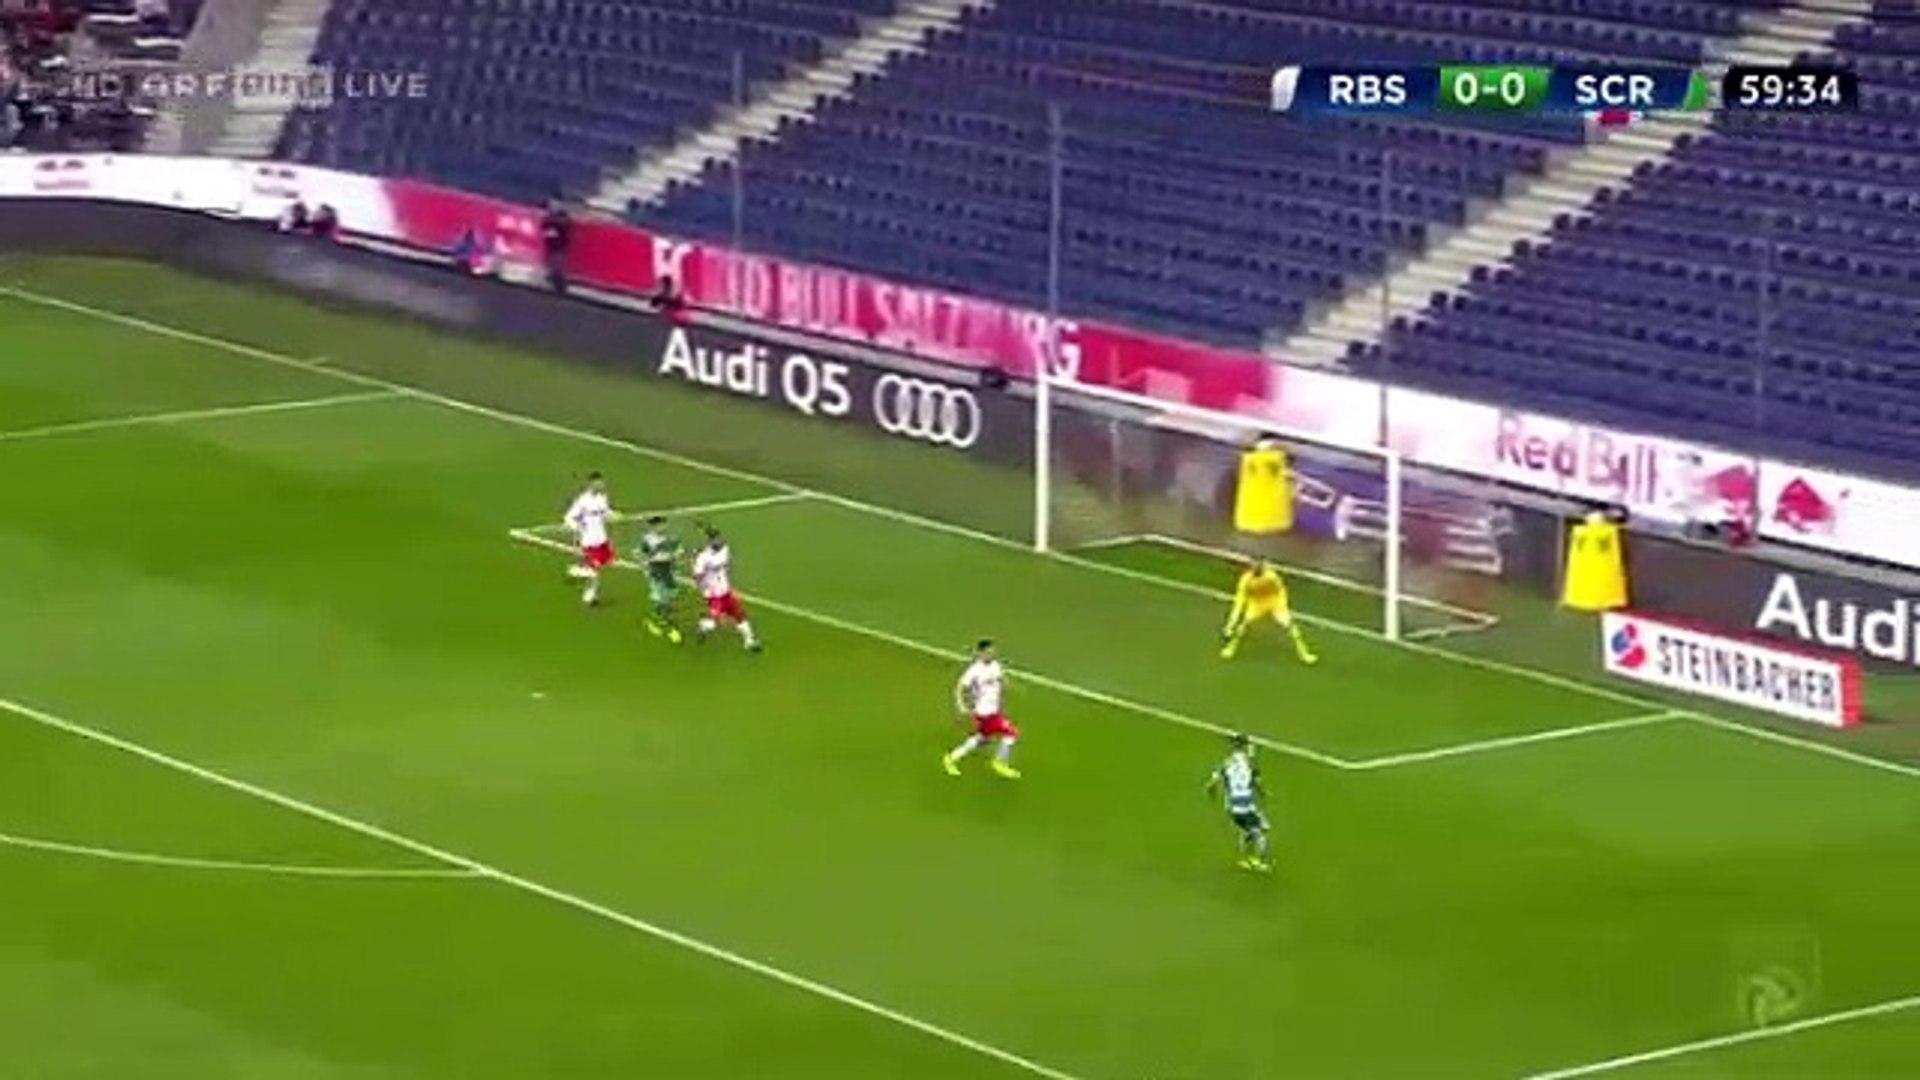 Dejan Ljubicic Goal Hd Rb Salzburg 0 1 Rapid Vienna 10 09 2017 Video Dailymotion